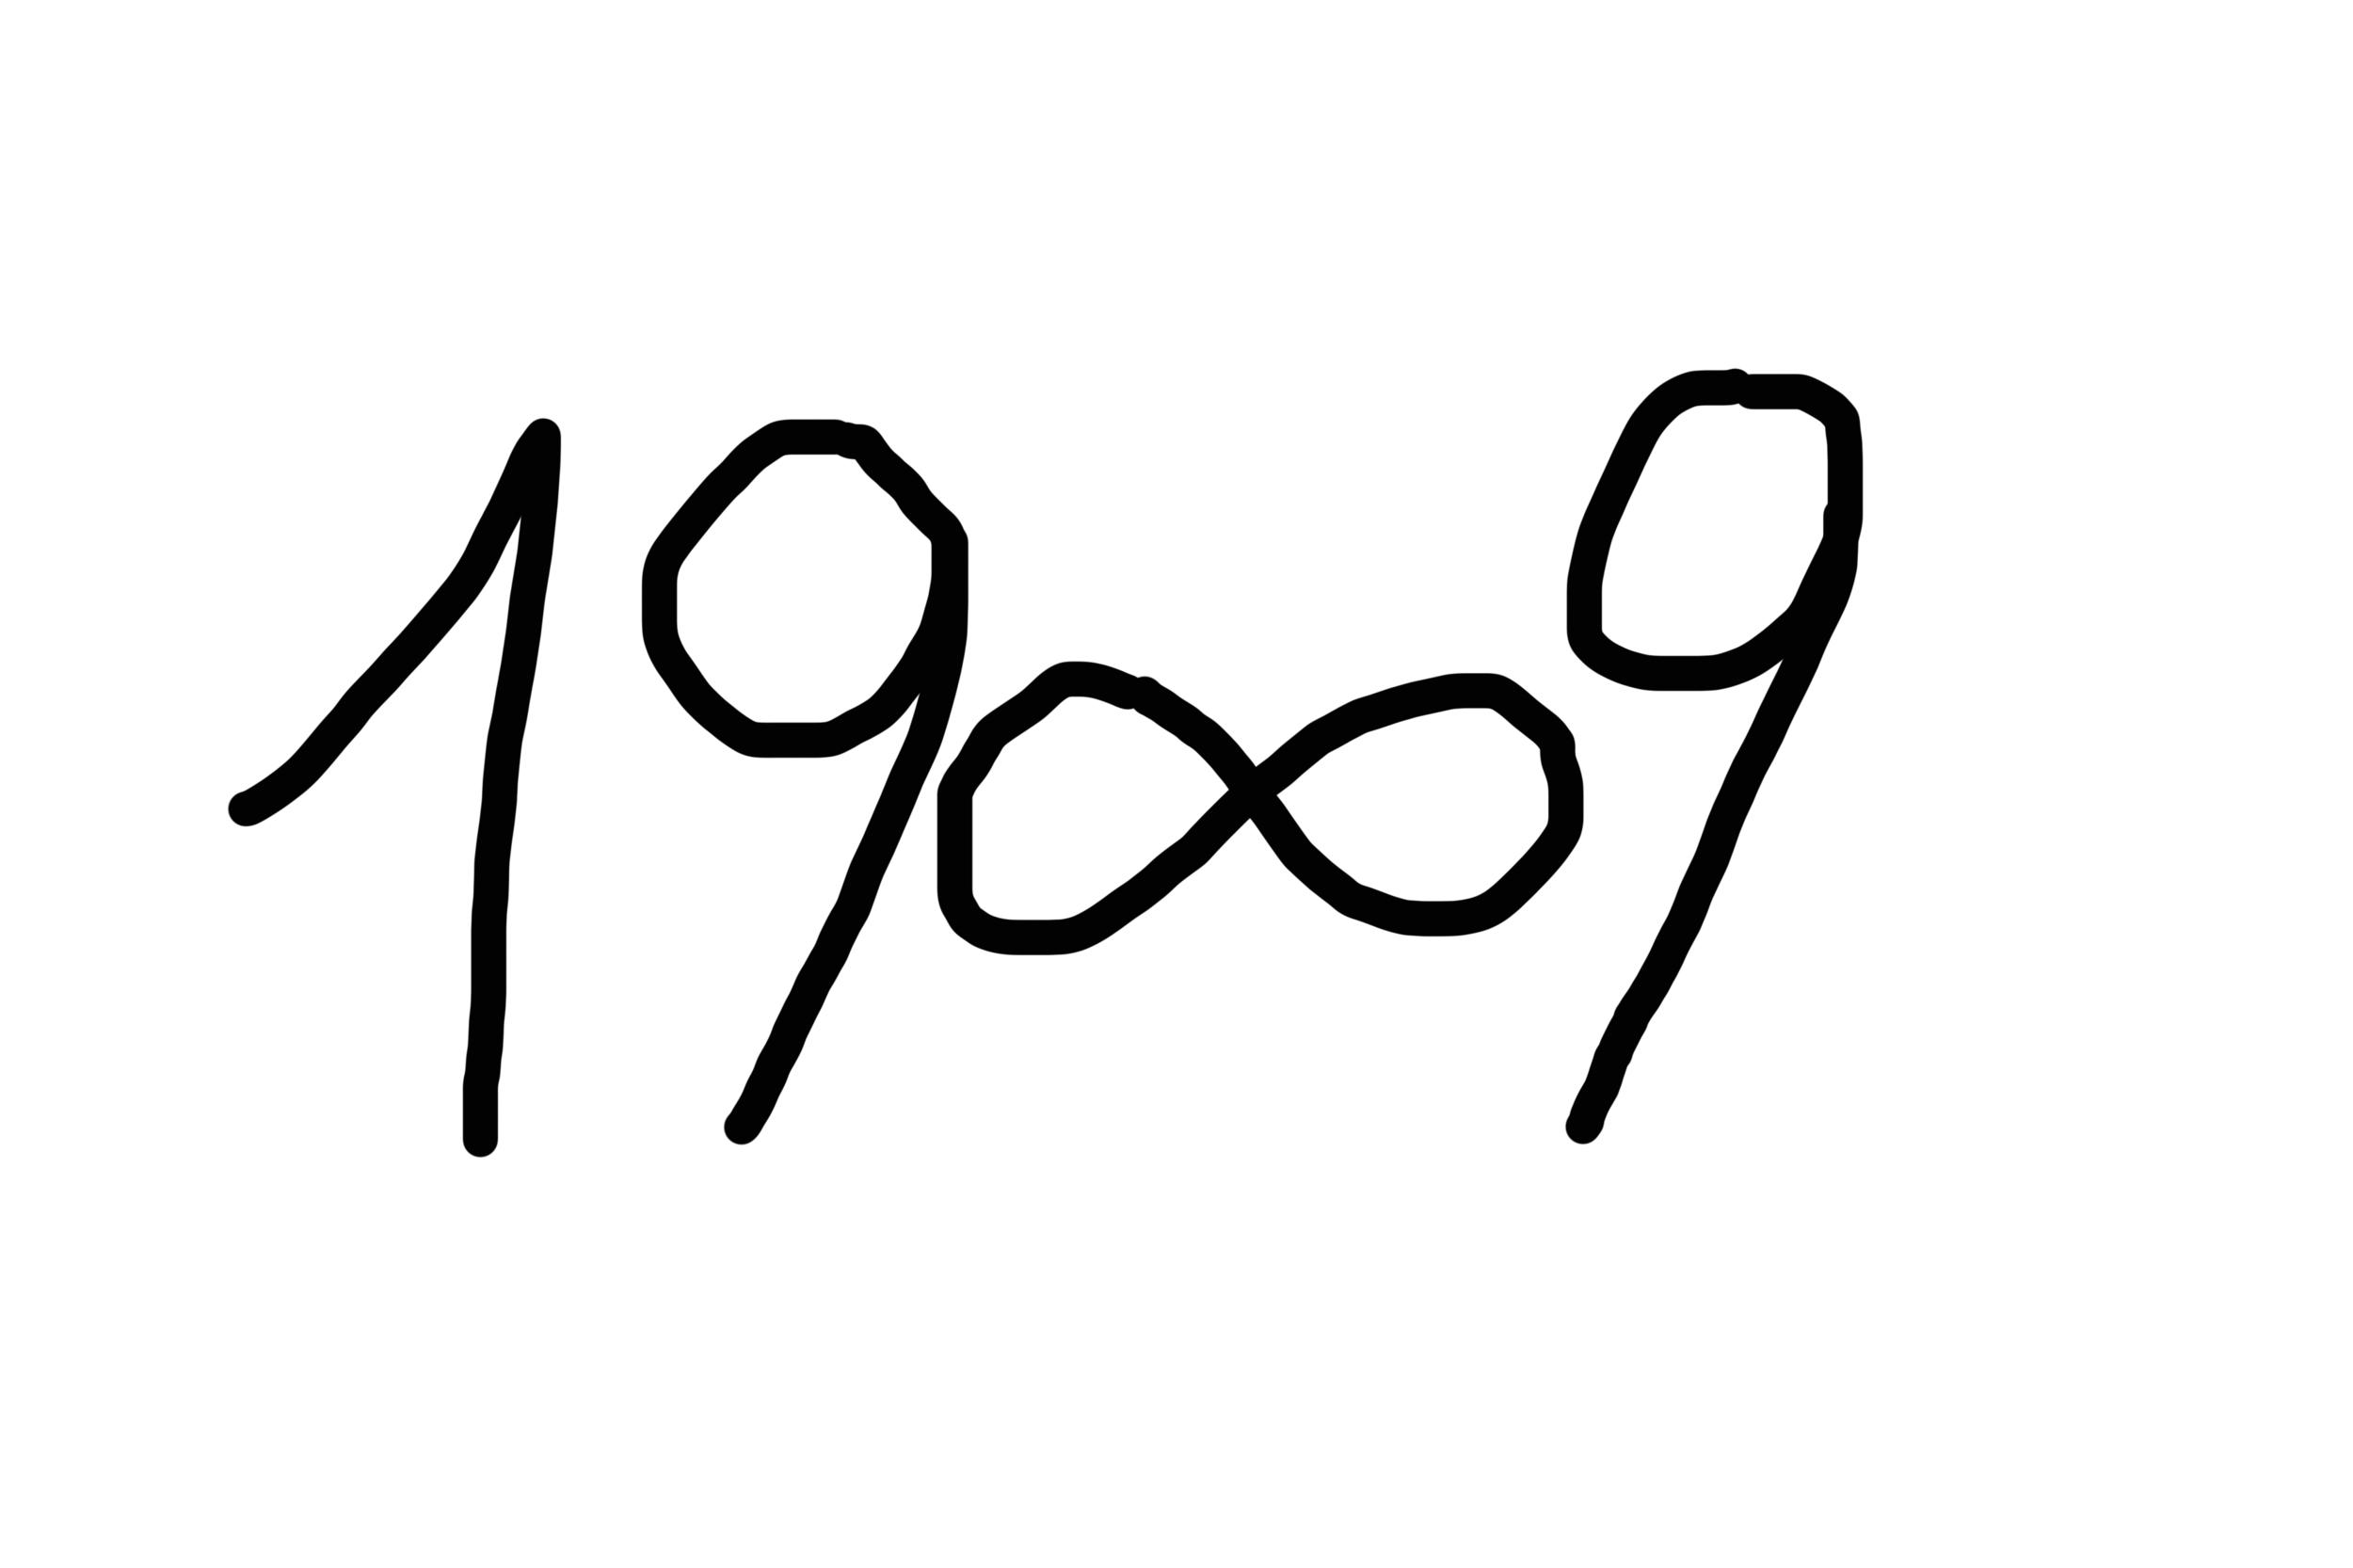 1989 drawing.jpg